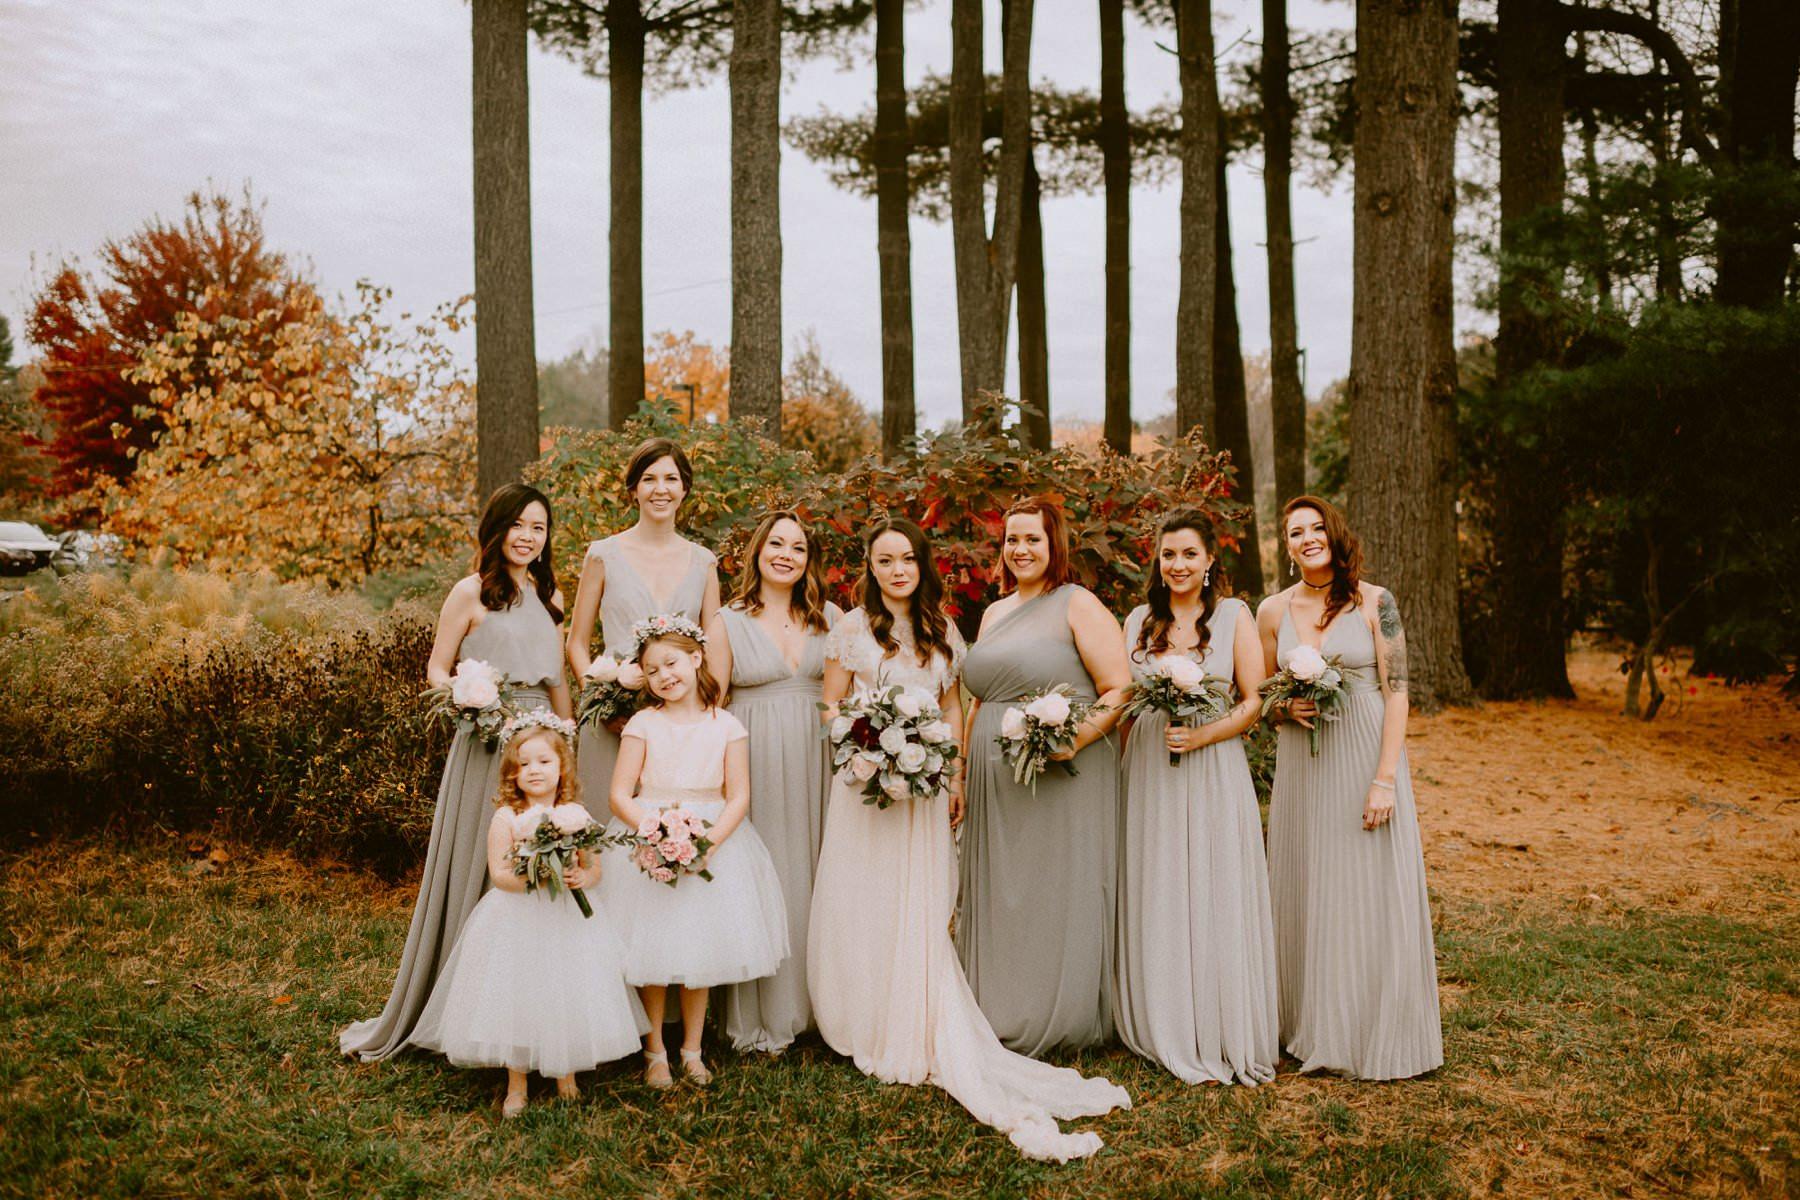 Tyler_arboretum_wedding-020.jpg